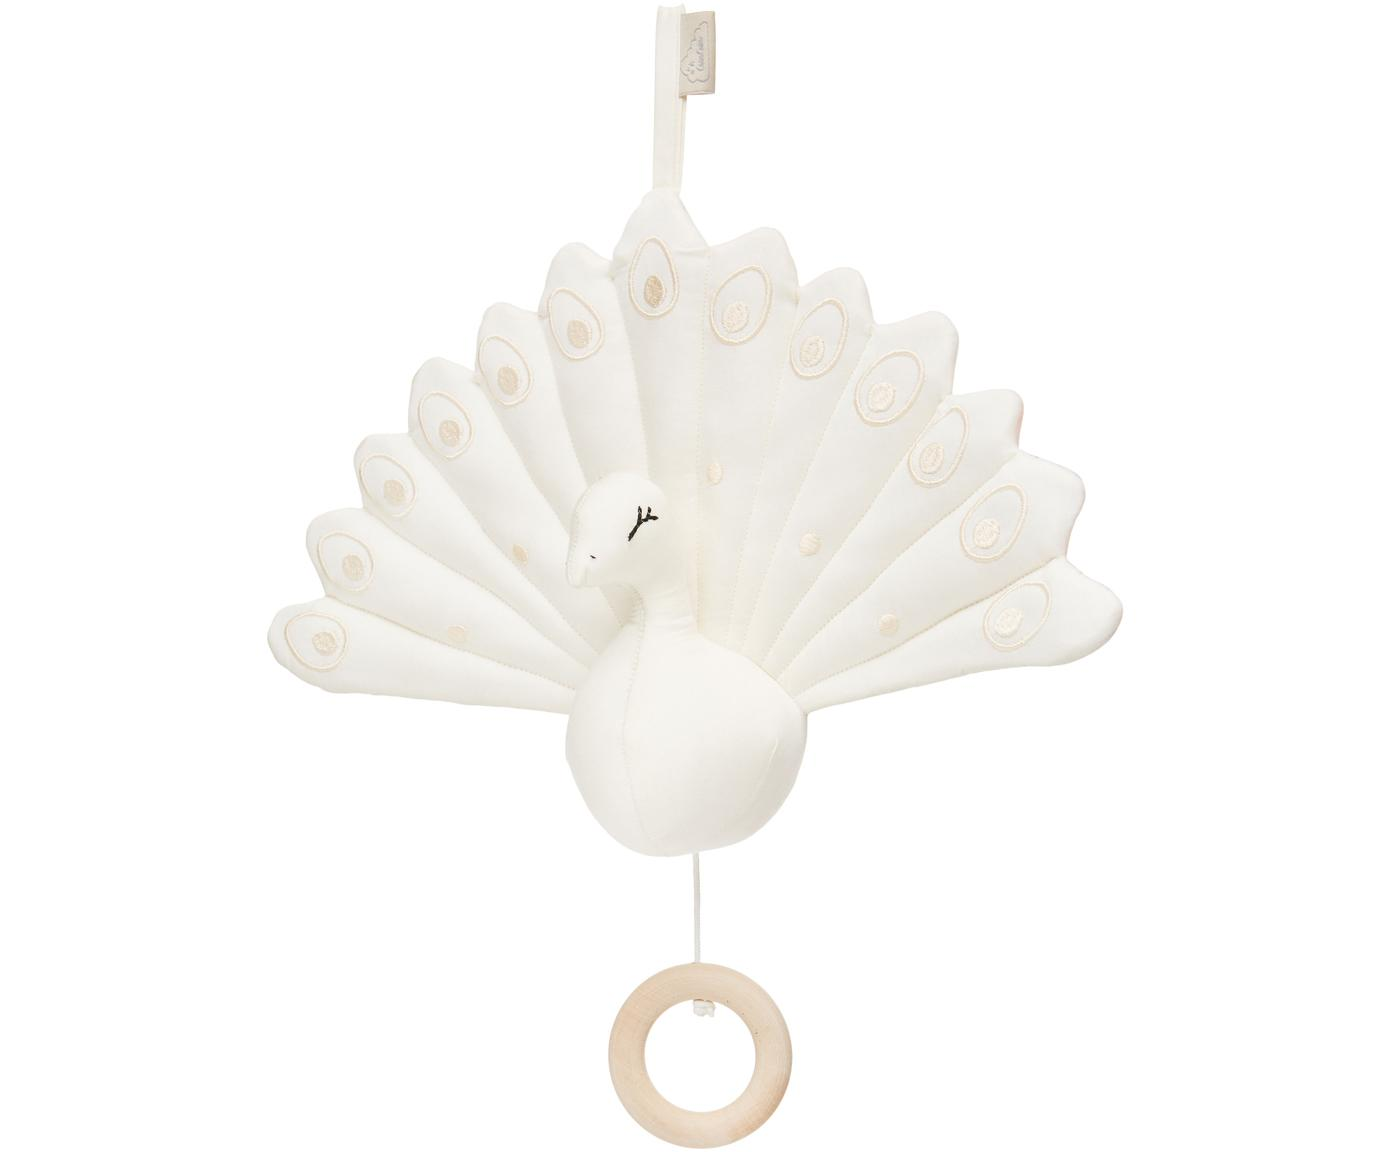 Sonajero colgante de algodón ecológico Peacock, Exterior: algodón ecológico, Crema, An 18 x Al 24 cm